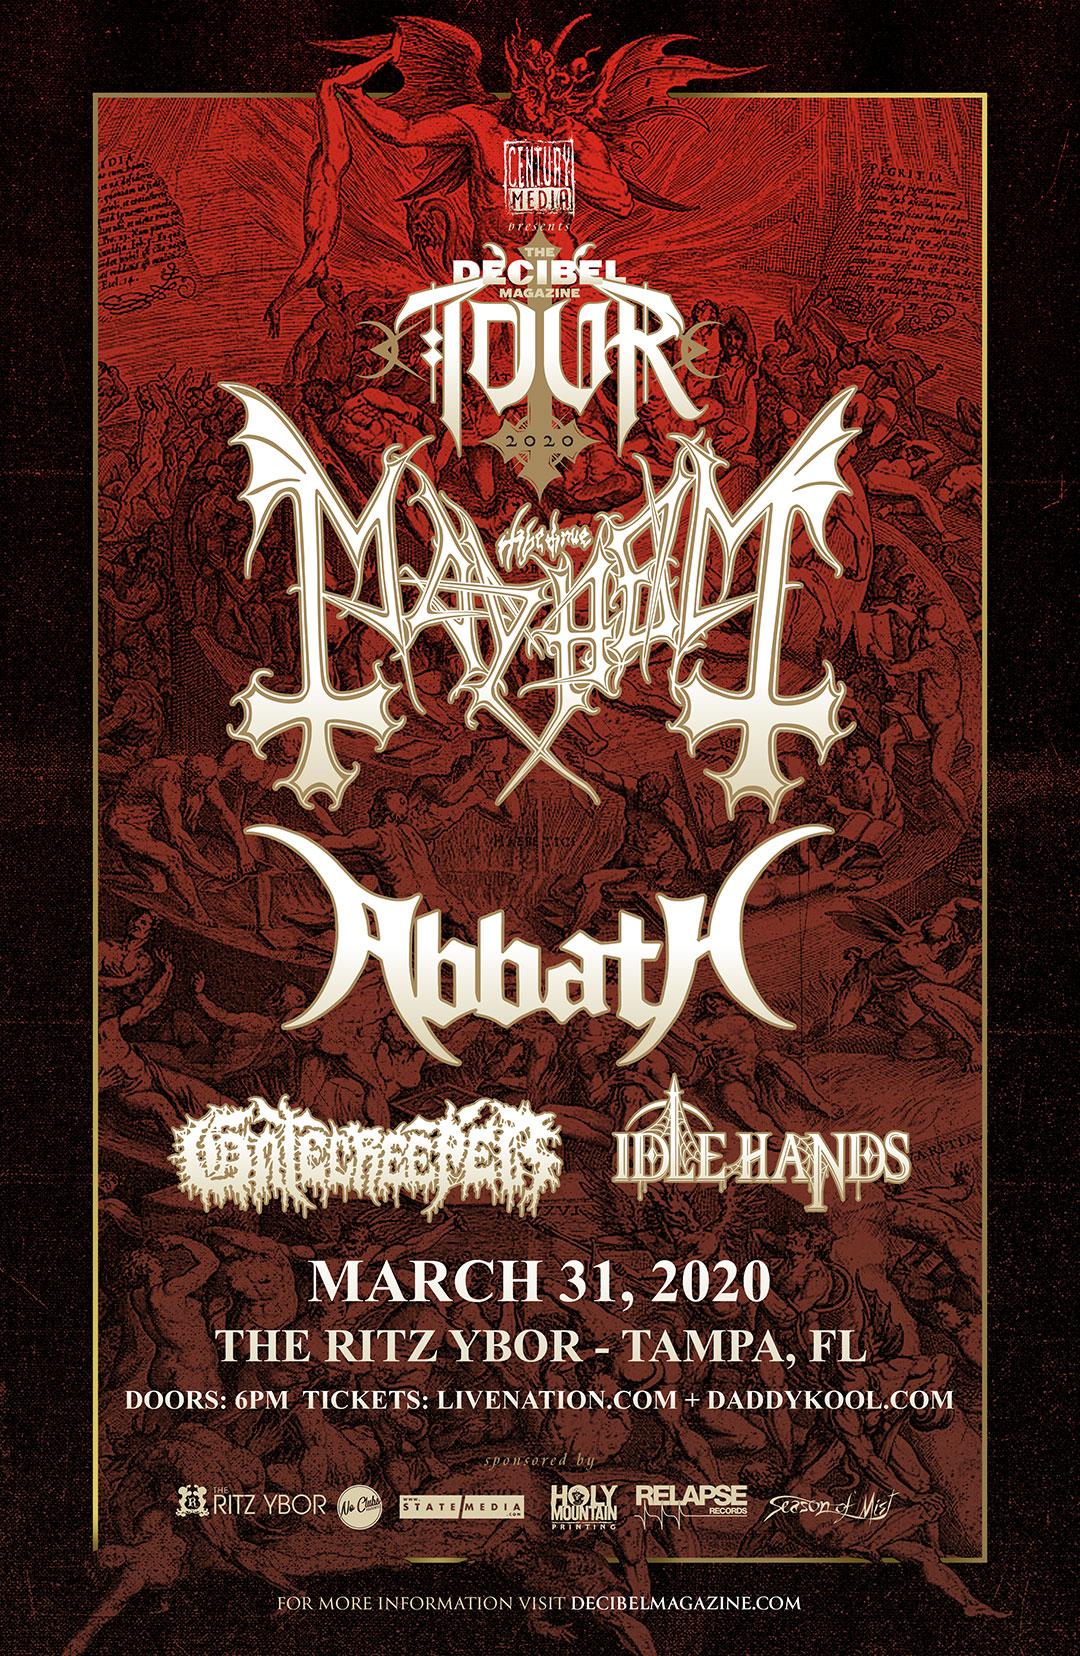 The Decibel Magazine Tour ft. Mayhem & Abbath at The RITZ Ybor – 3/31/2020